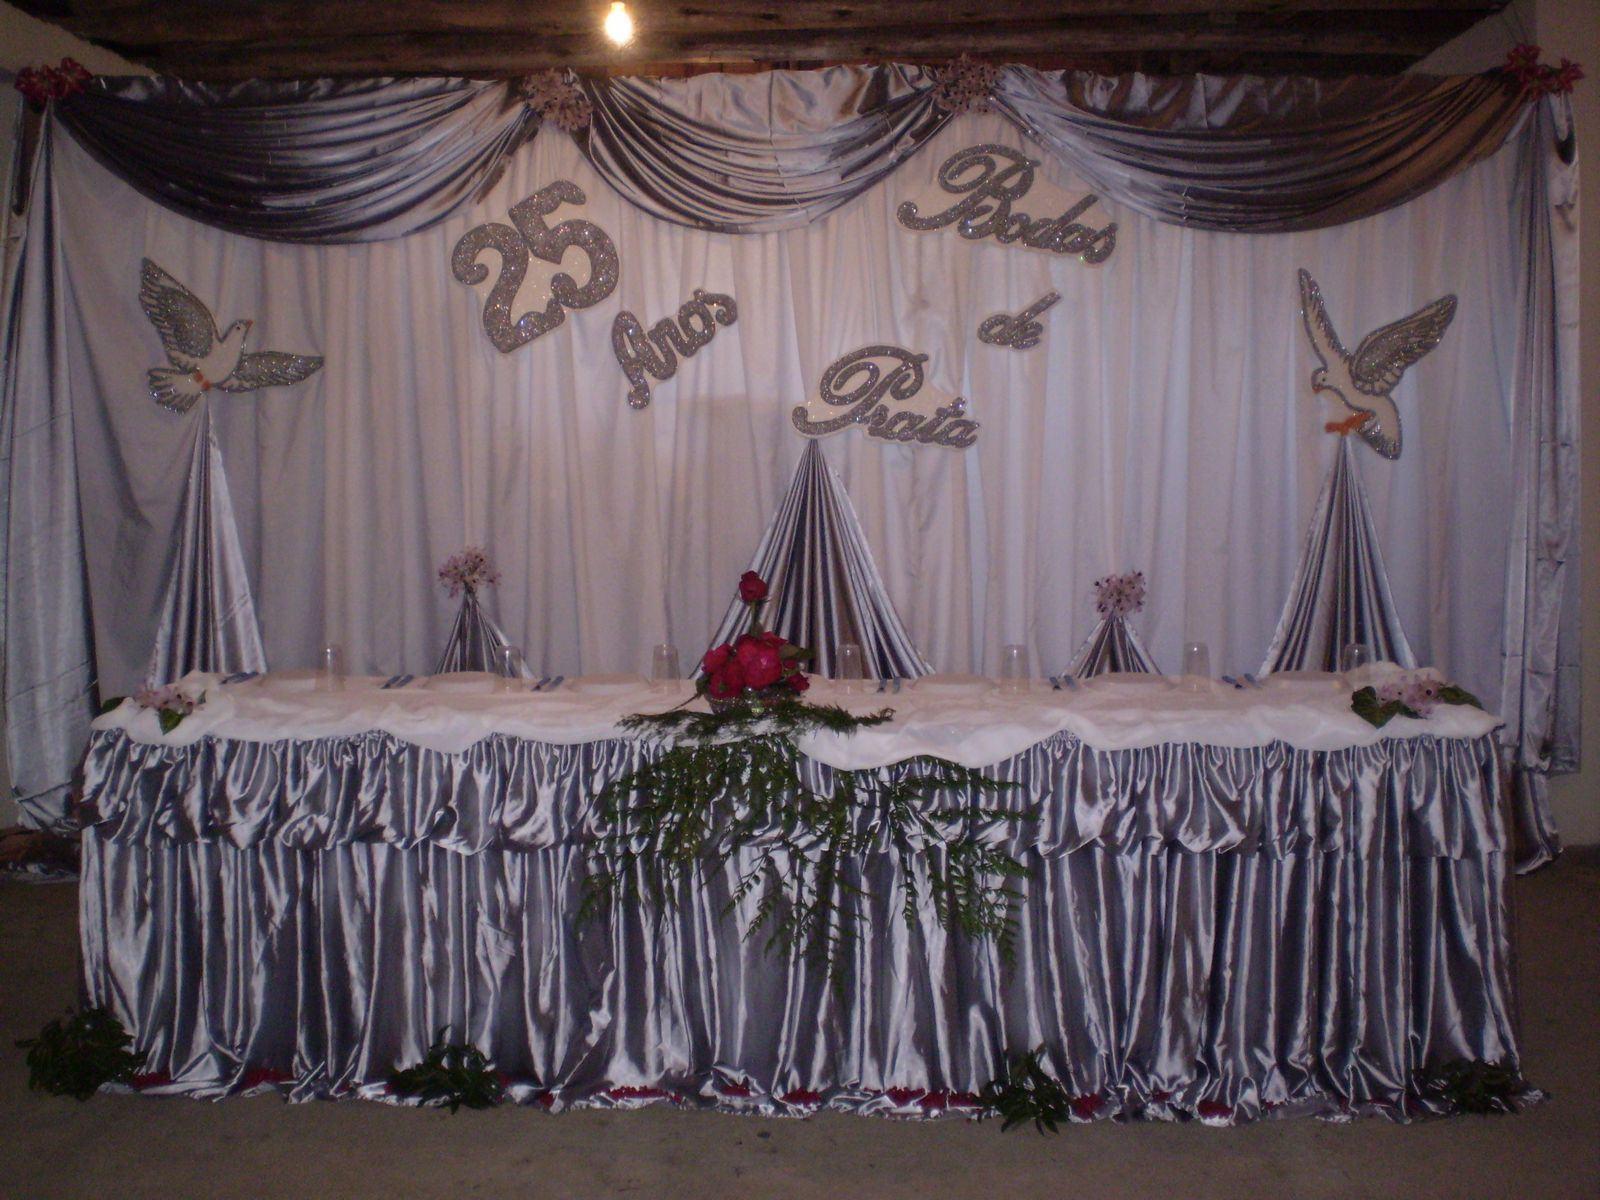 decoracao de bodas de prata 2